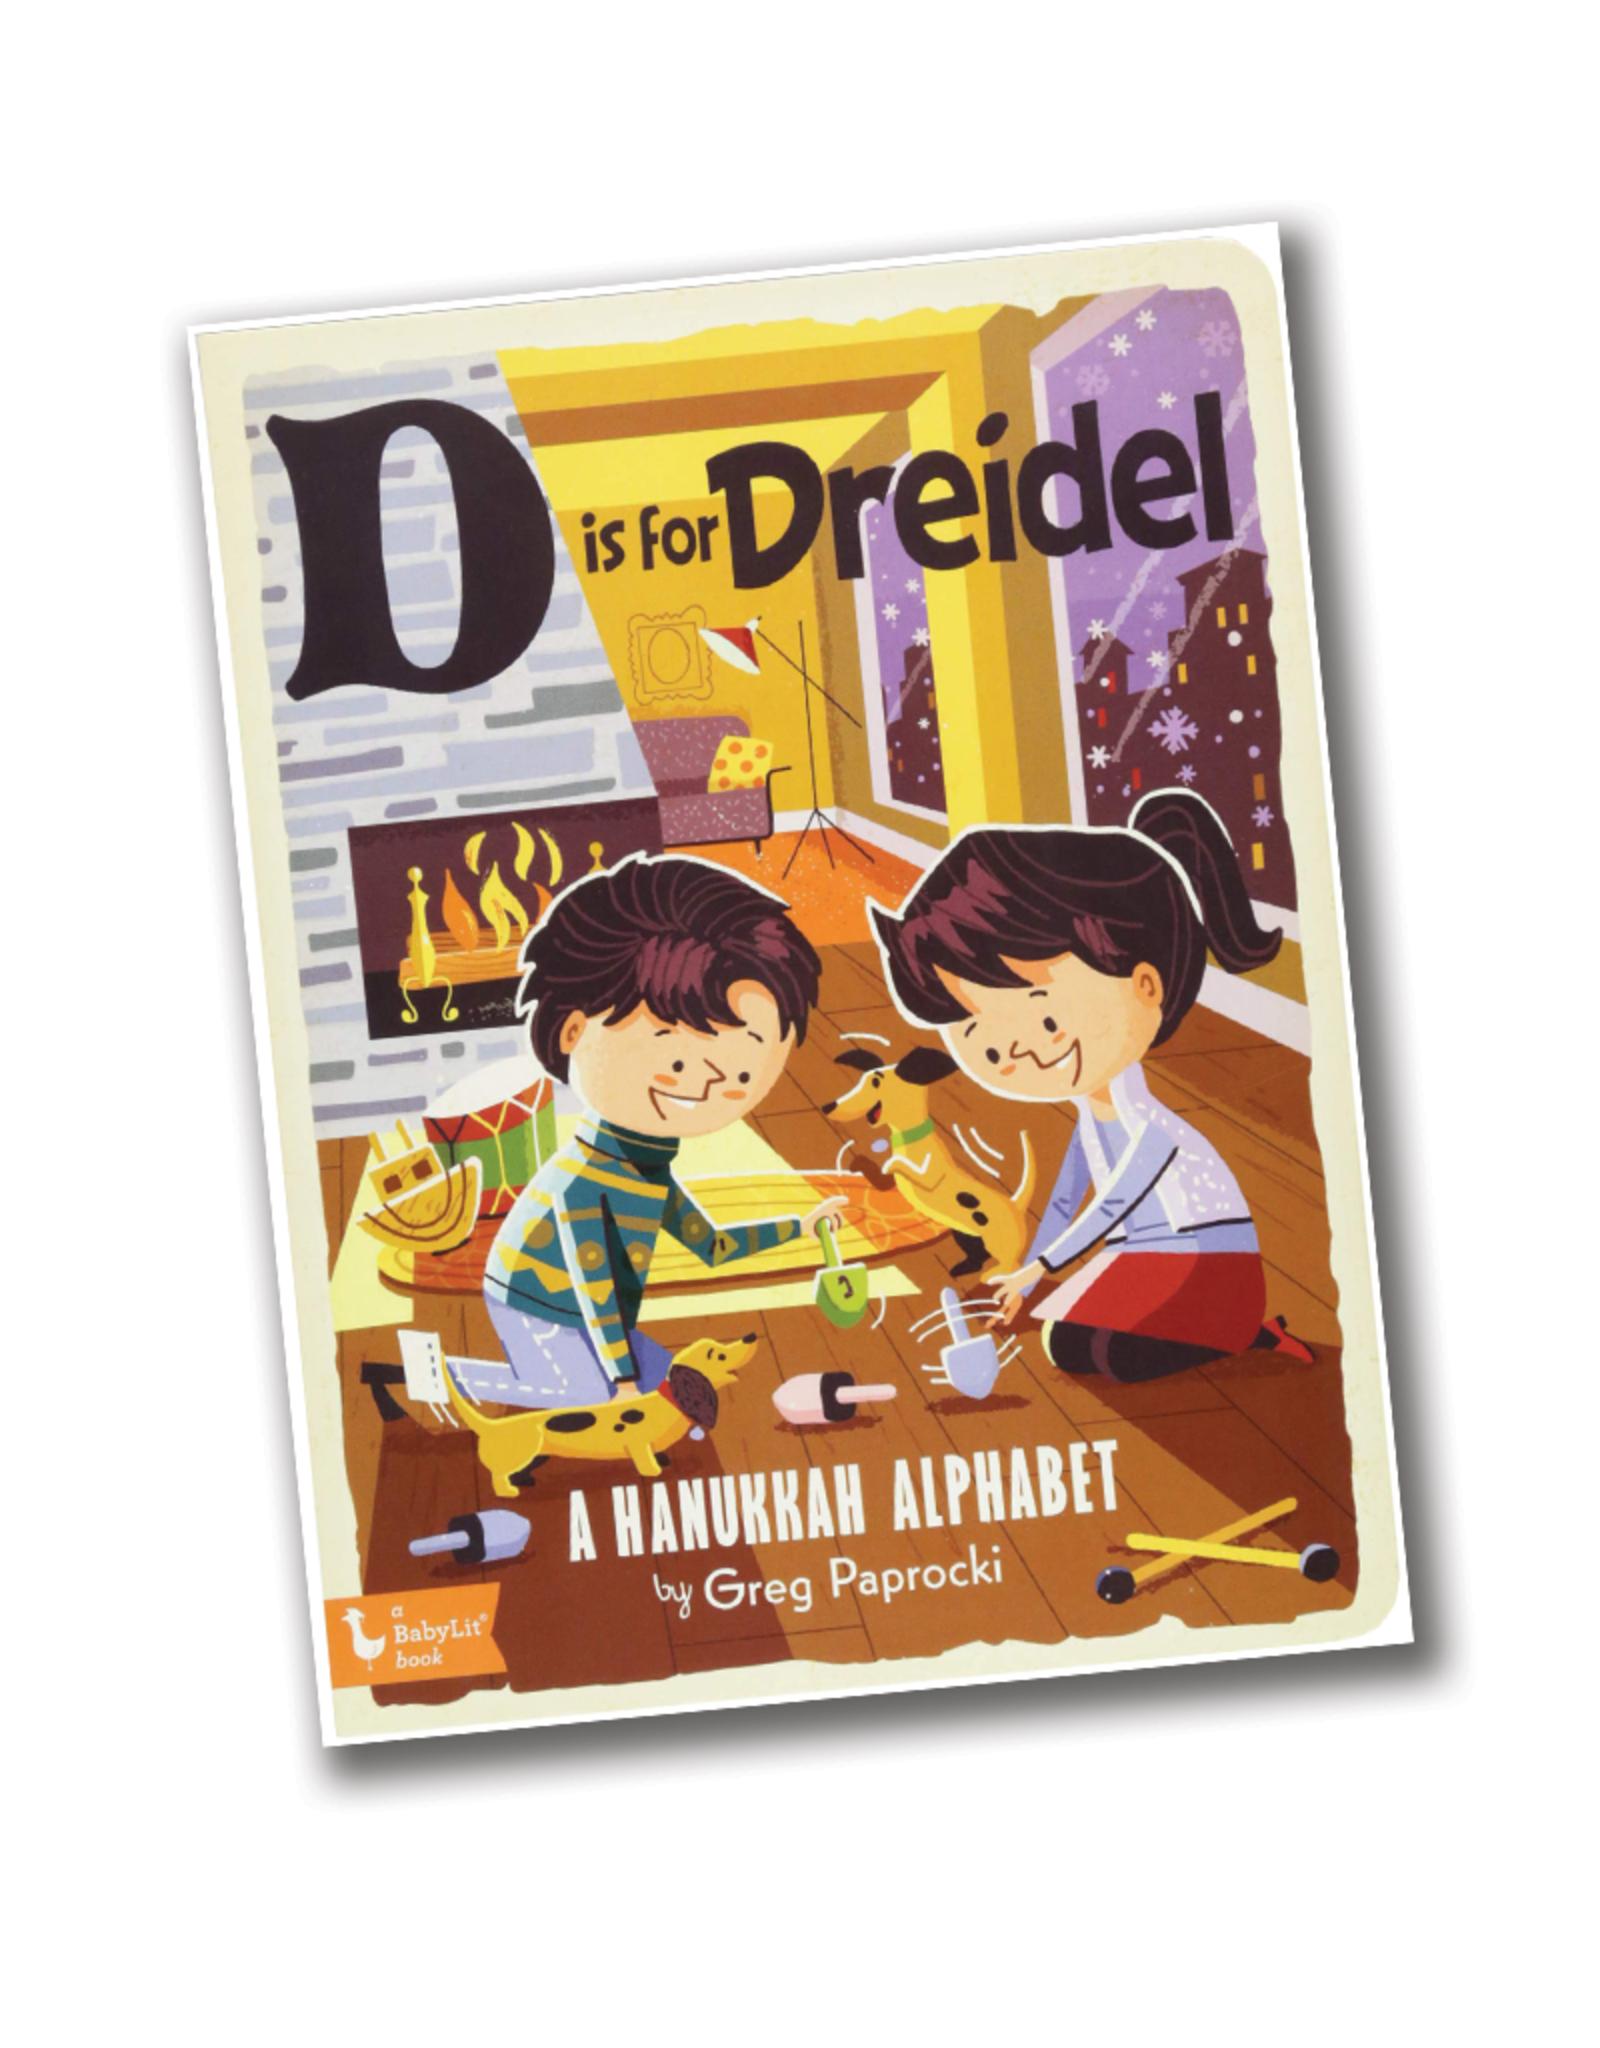 D is for Dreidel